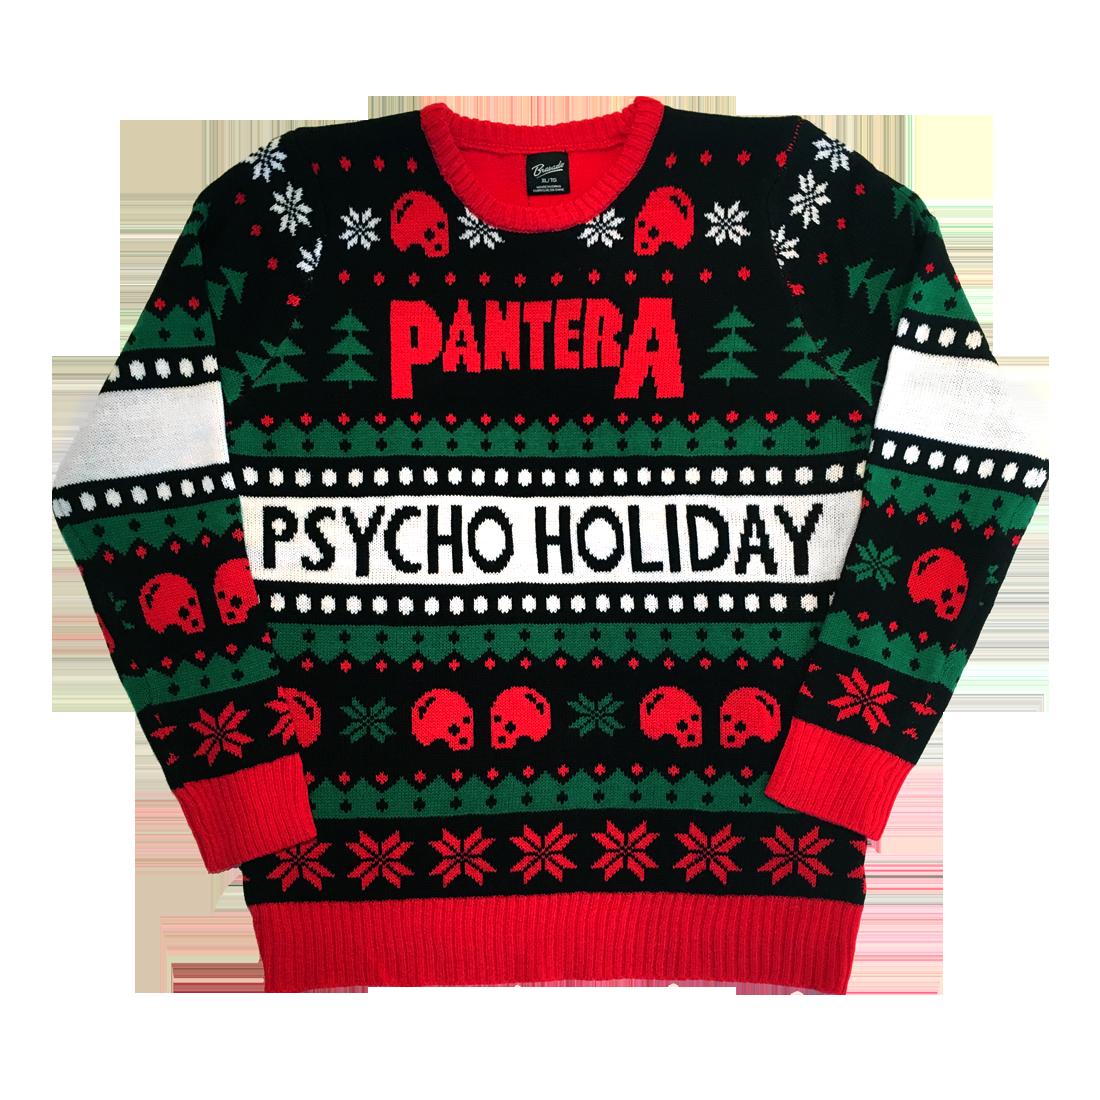 Pantera Holiday Psycho Holiday Sweater 48 Maglioni